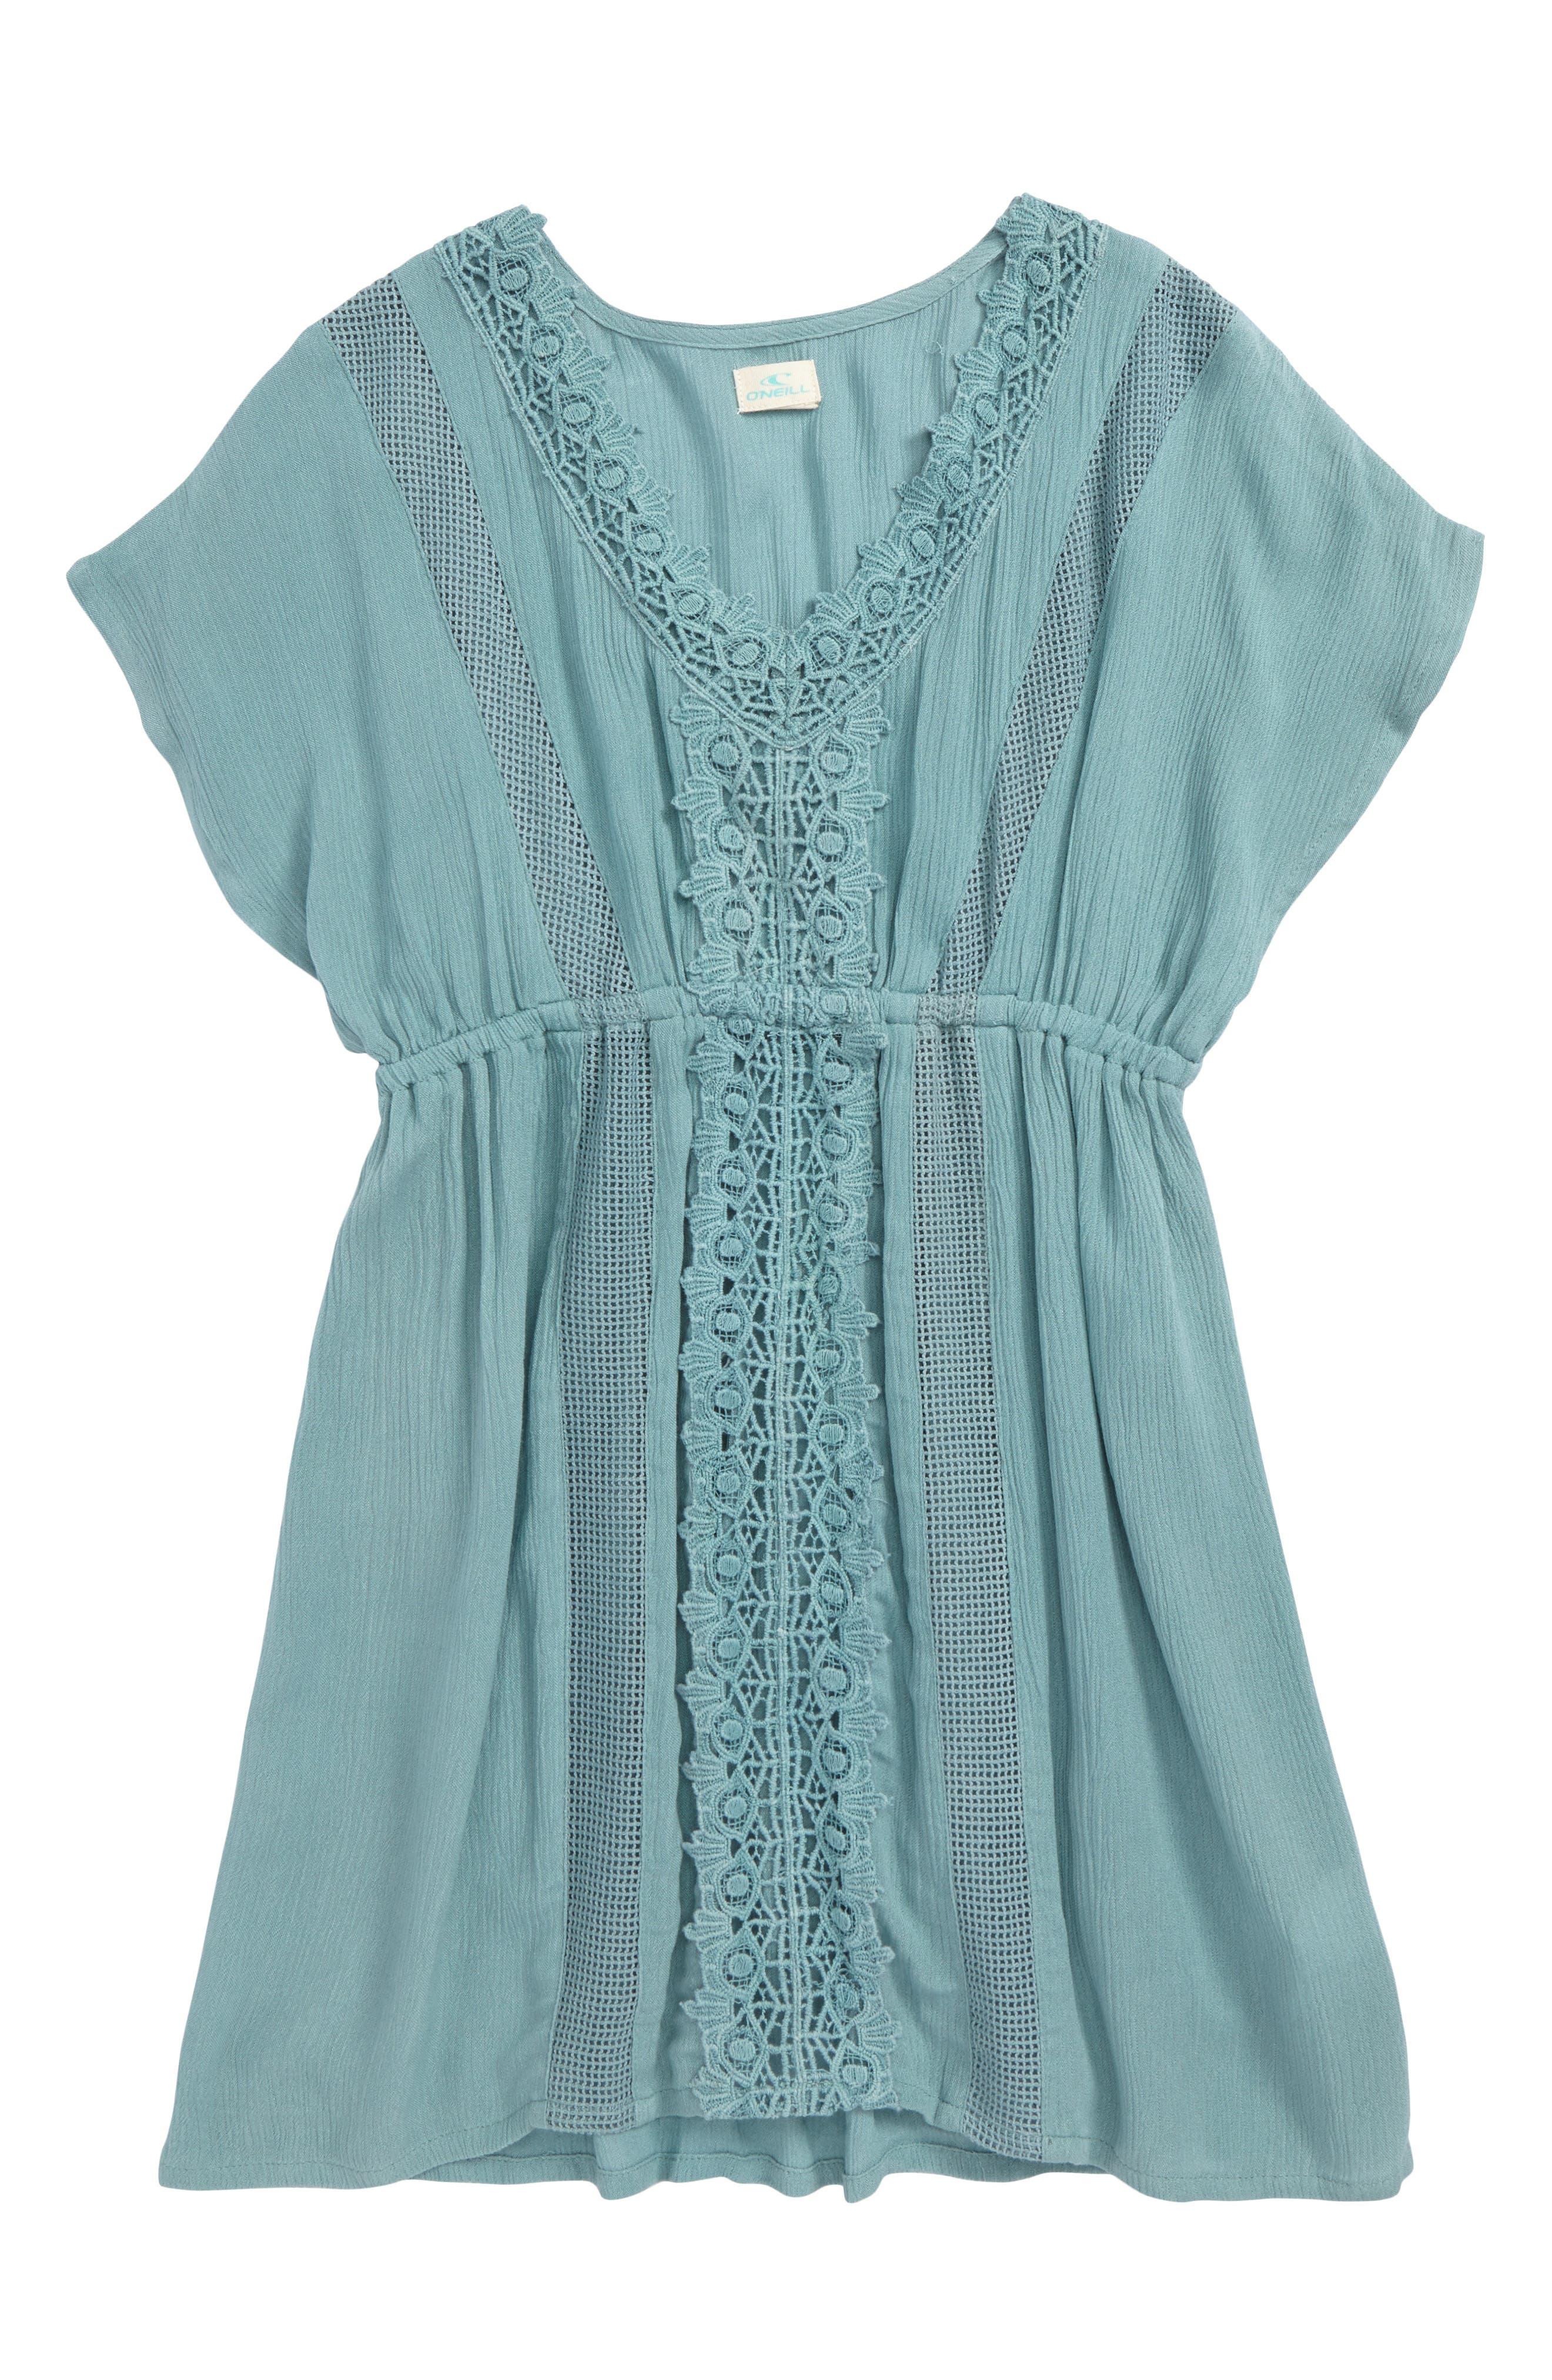 Kayla Crochet Cover-Up Dress,                         Main,                         color, Aqua Blue - Aqu